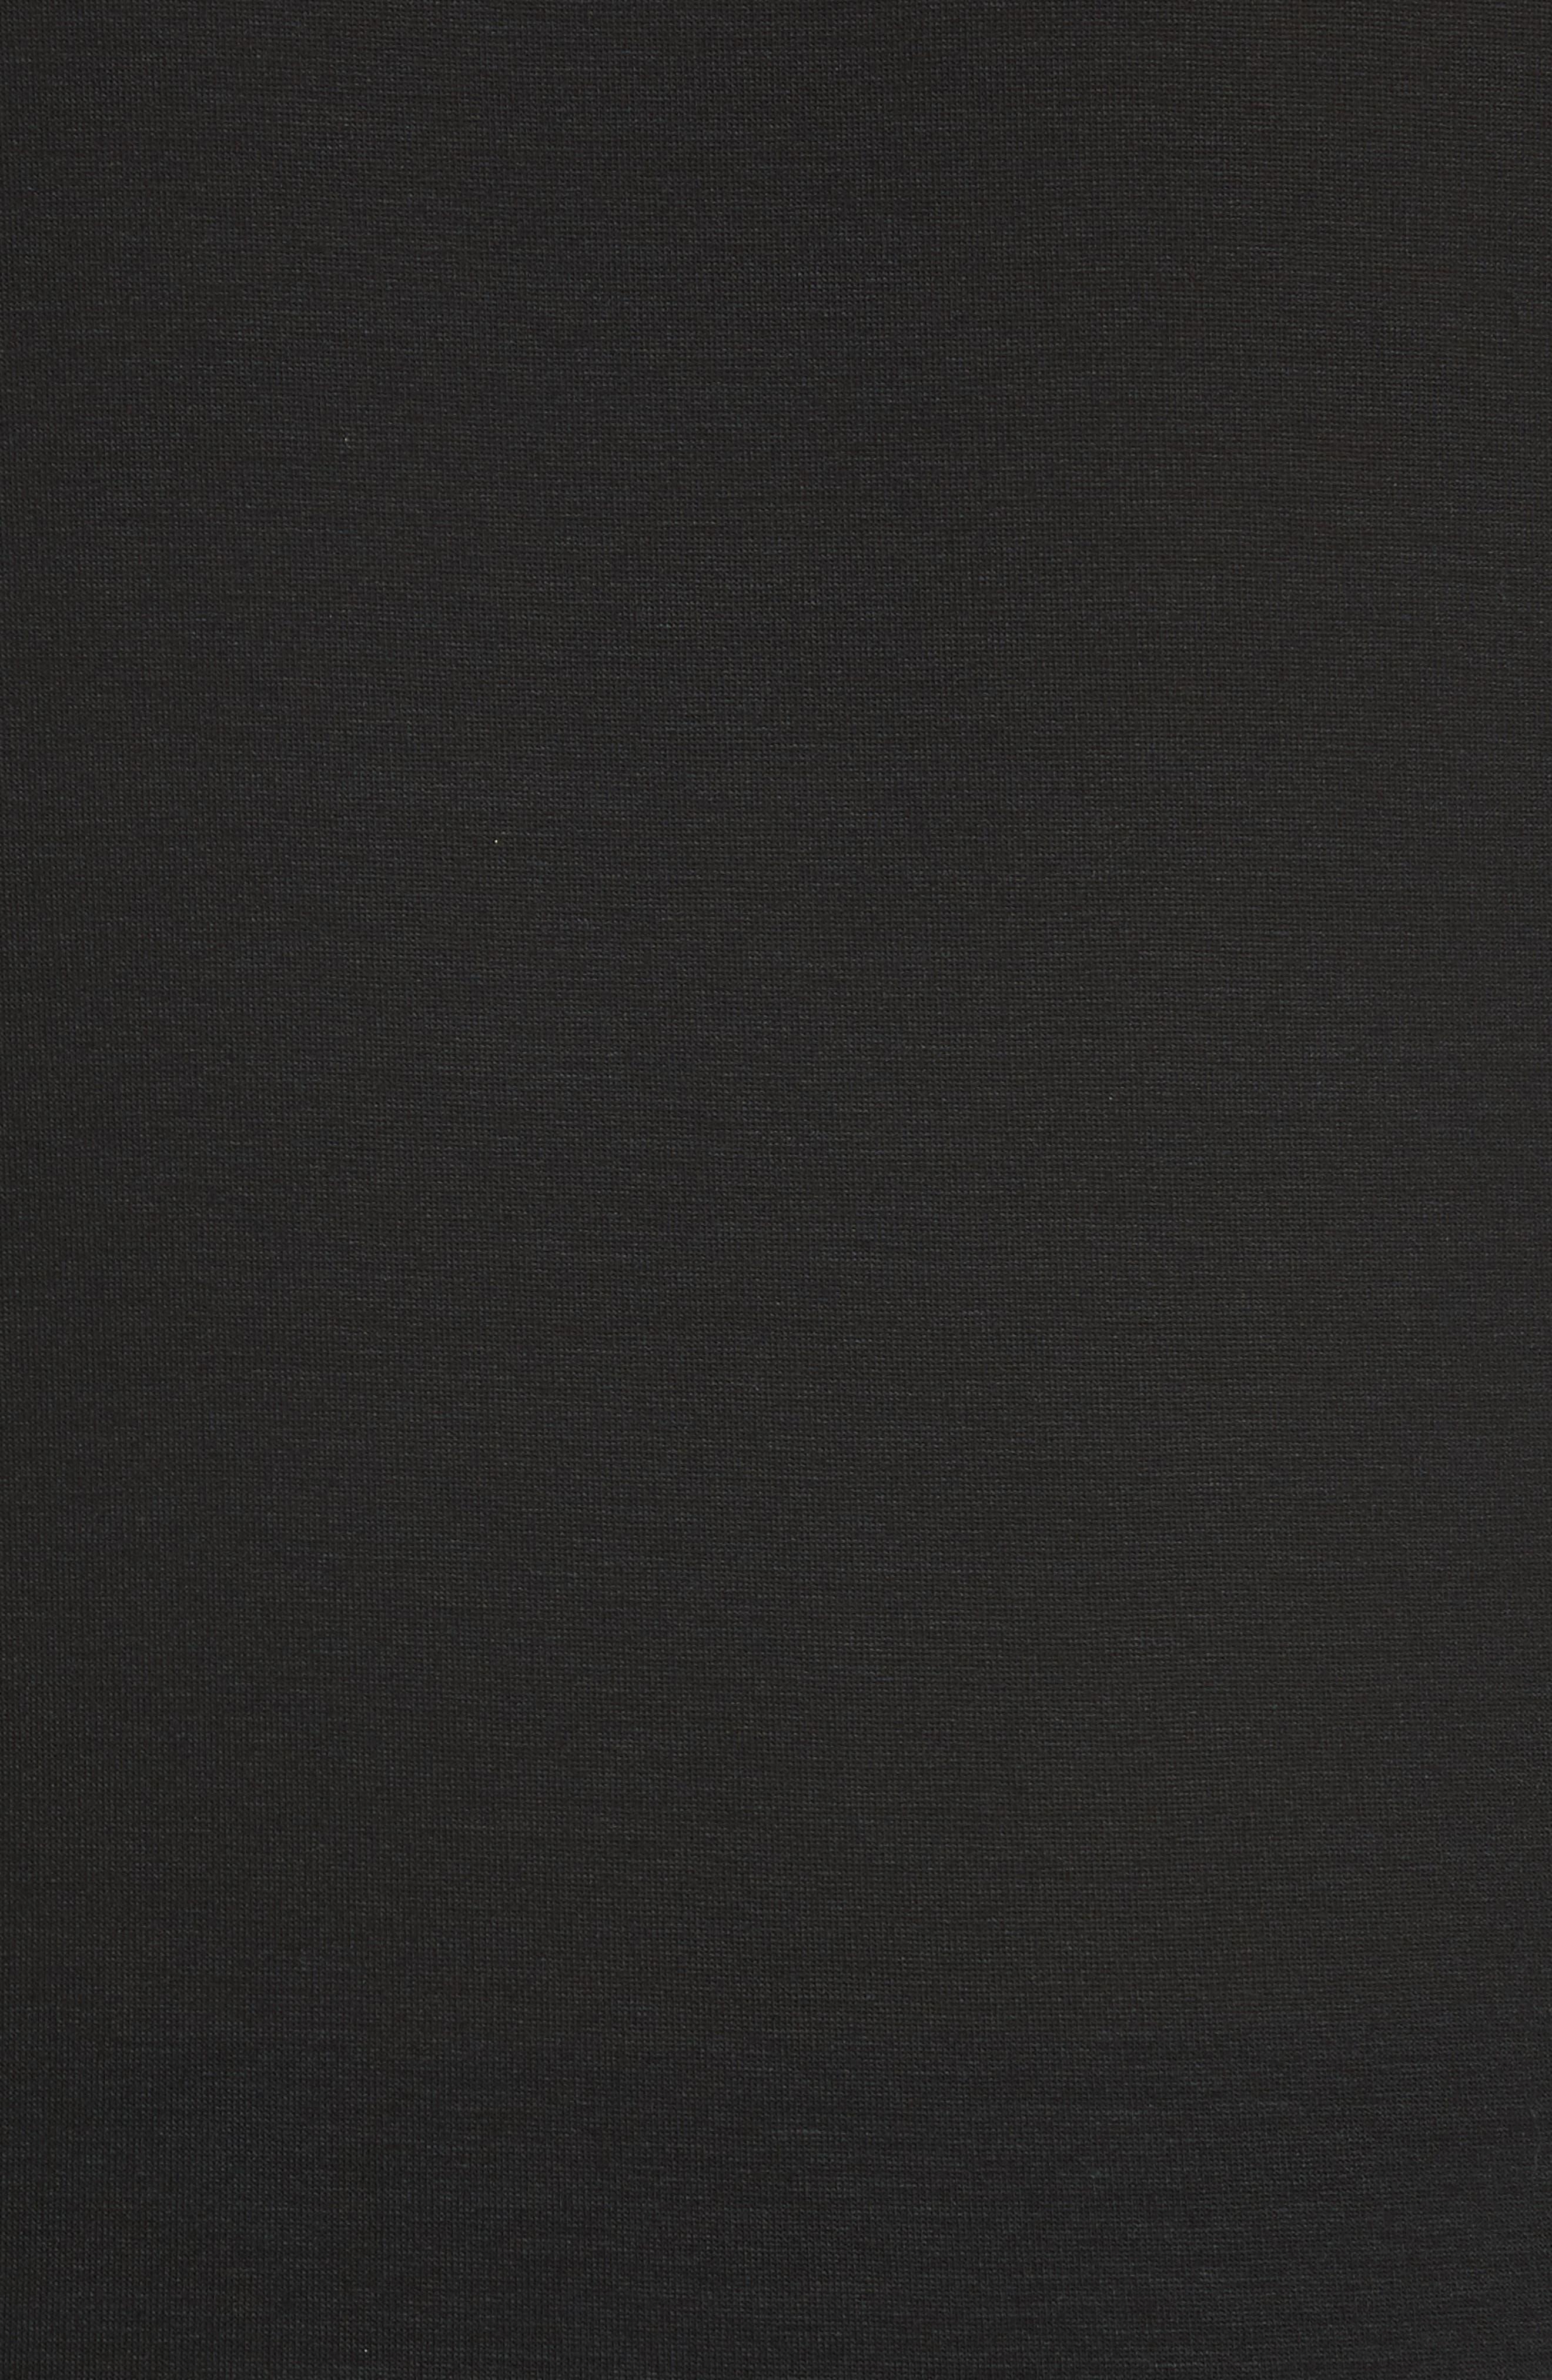 Piovra Jersey Tee,                             Alternate thumbnail 5, color,                             Black